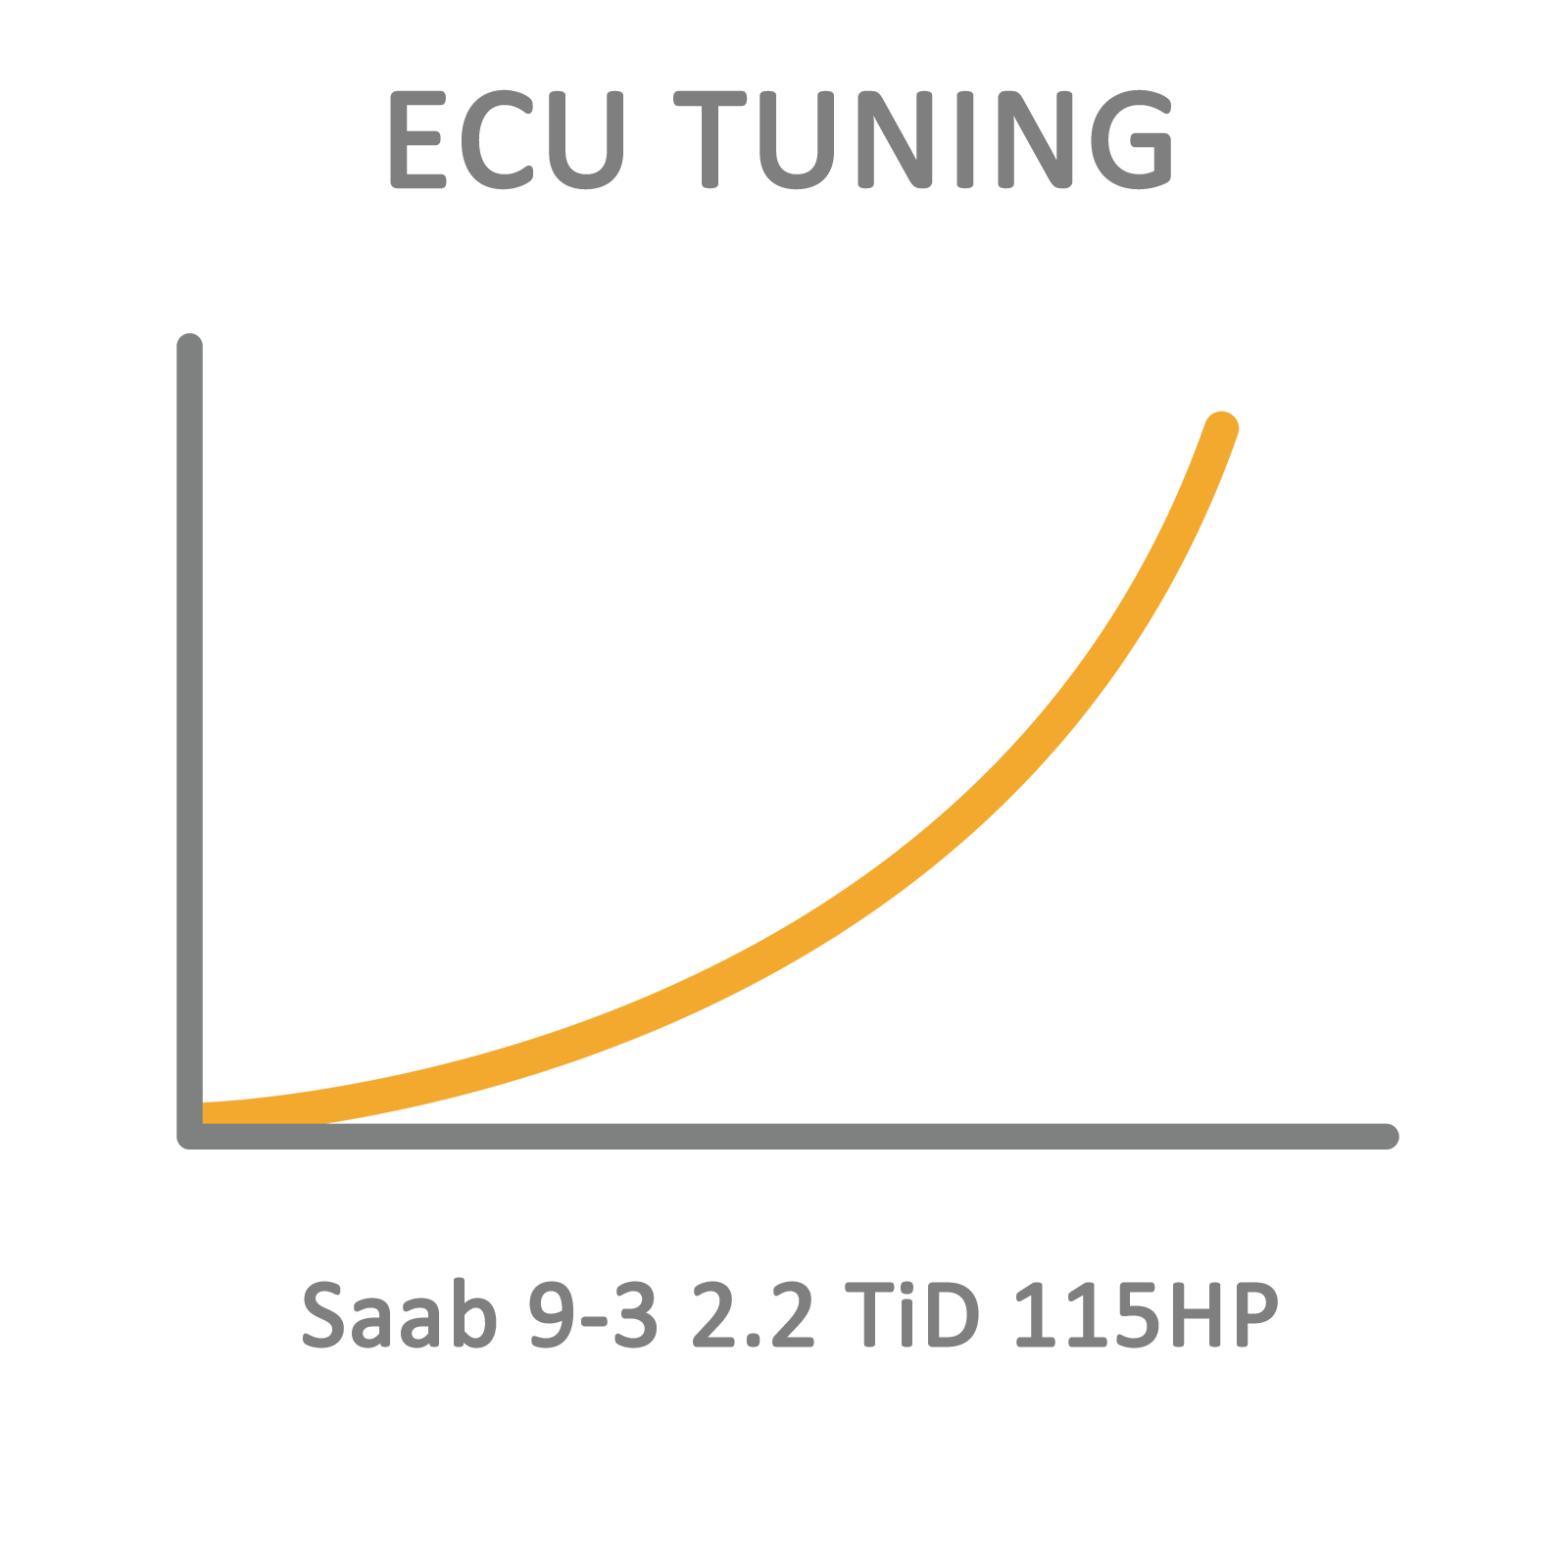 Saab 9-3 2.2 TiD 115HP ECU Tuning Remapping Programming